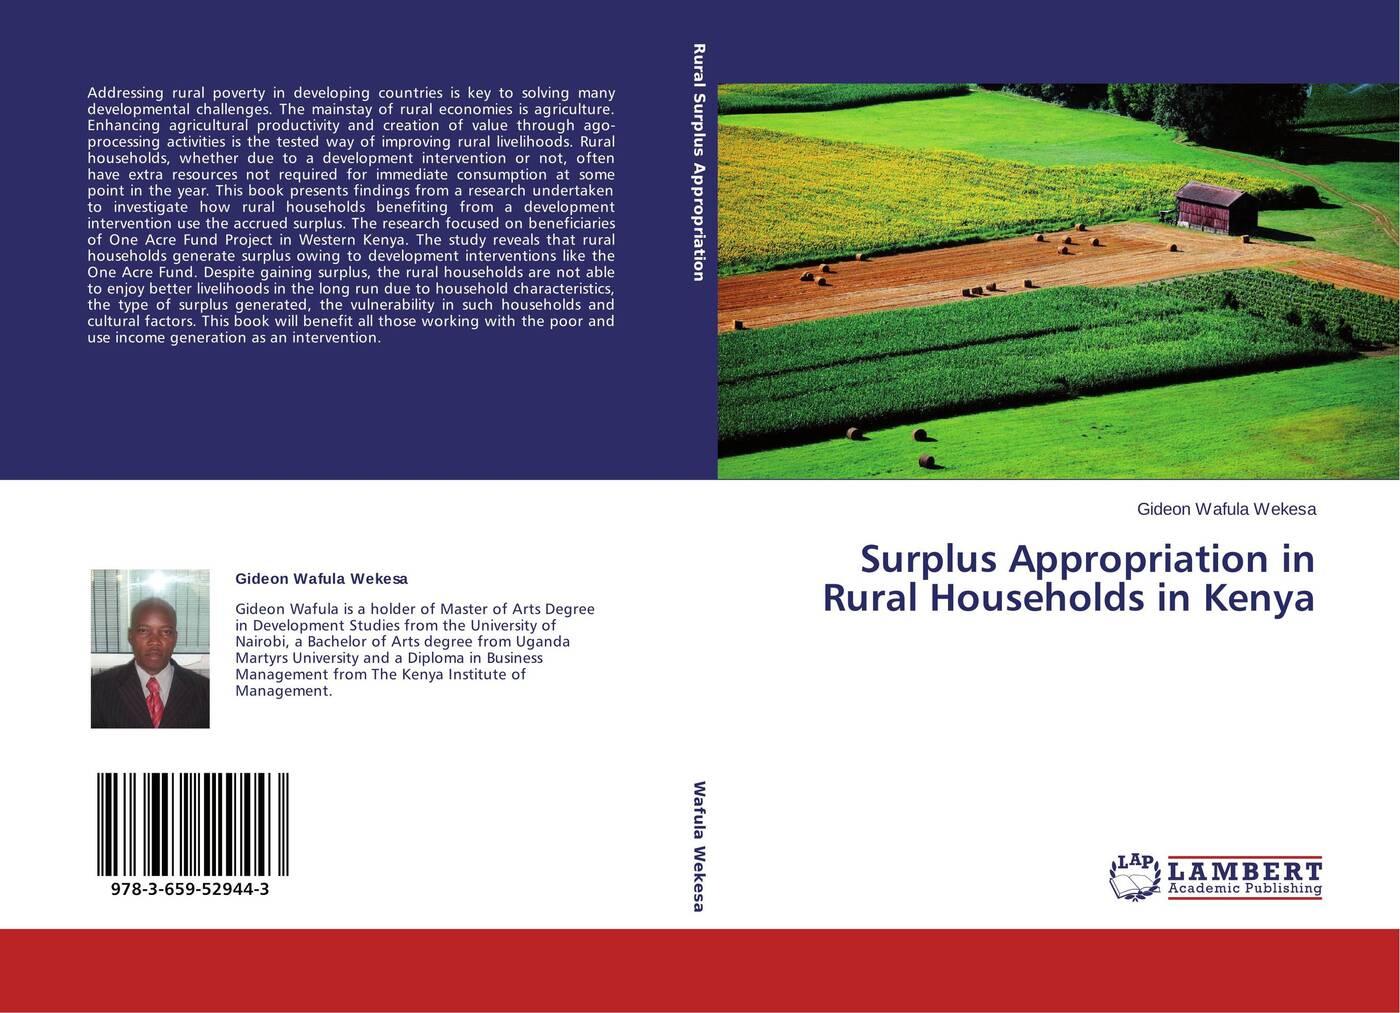 Gideon Wafula Wekesa Surplus Appropriation in Rural Households in Kenya цена в Москве и Питере